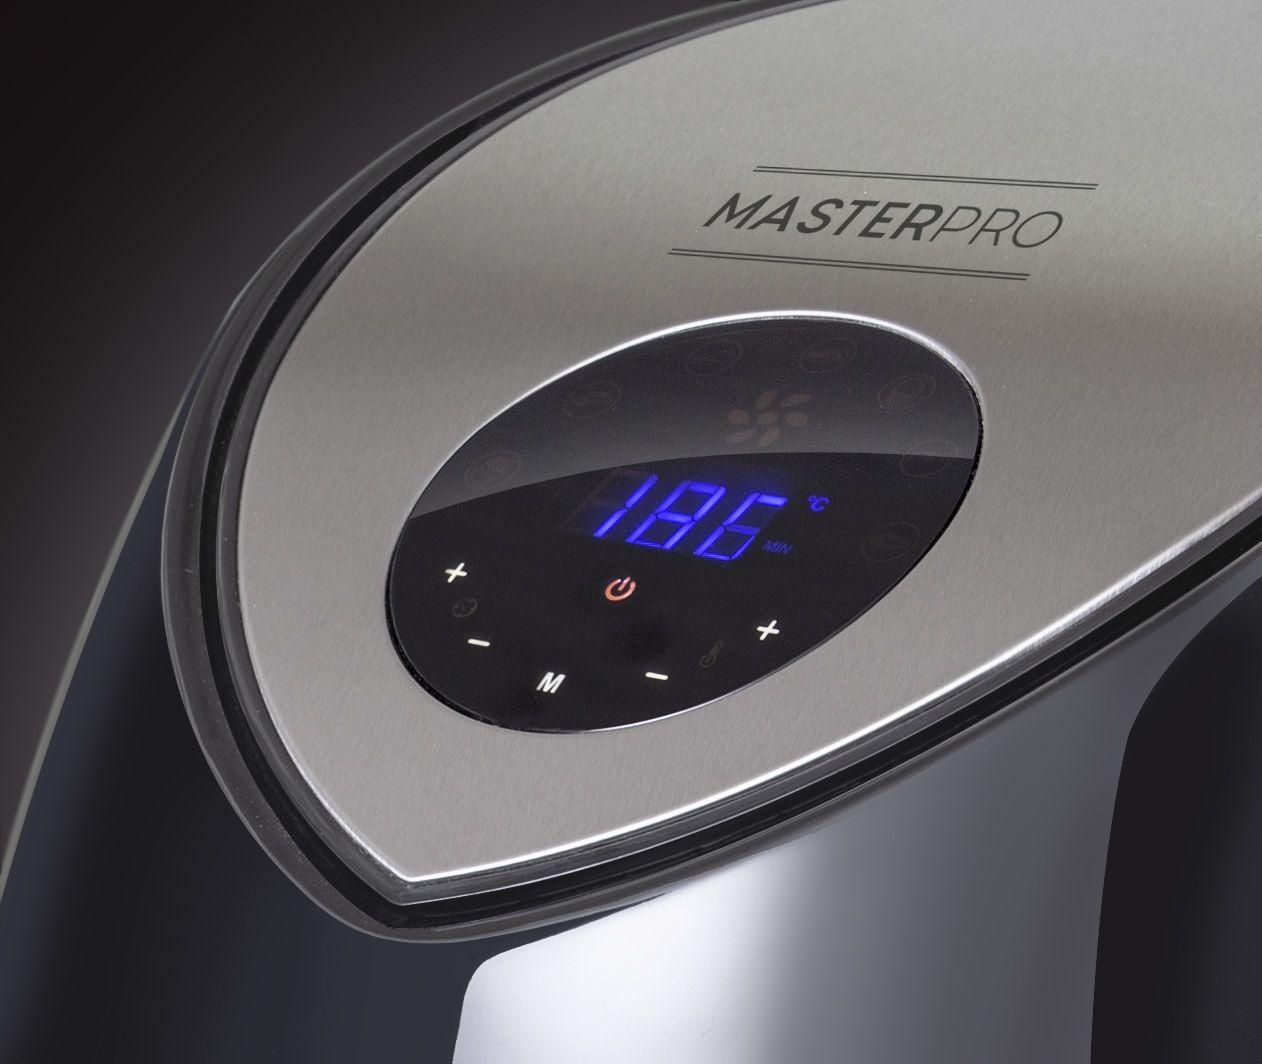 MasterPro: The Ultimate Airfryer image